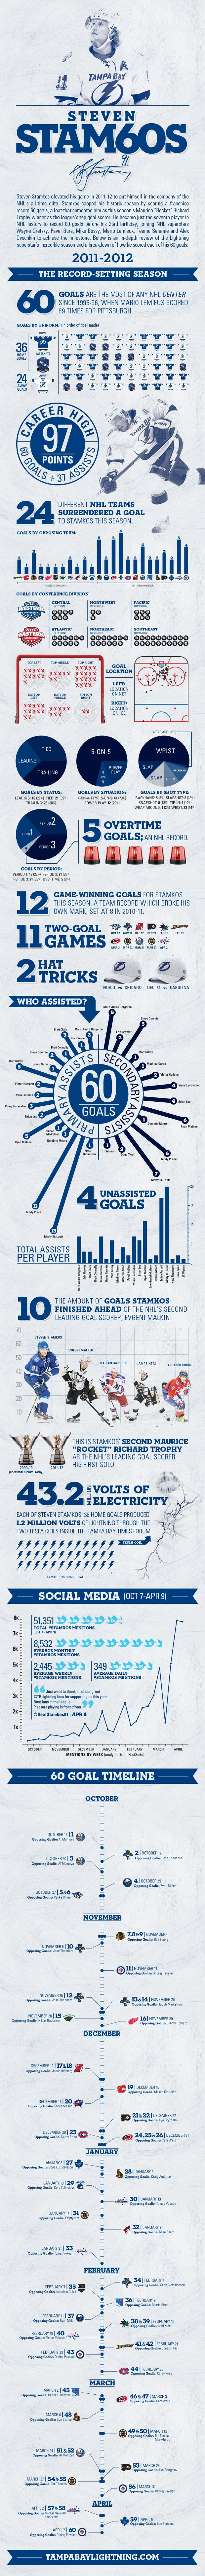 Infographic: Steven Stamkos' magical 60-goal season